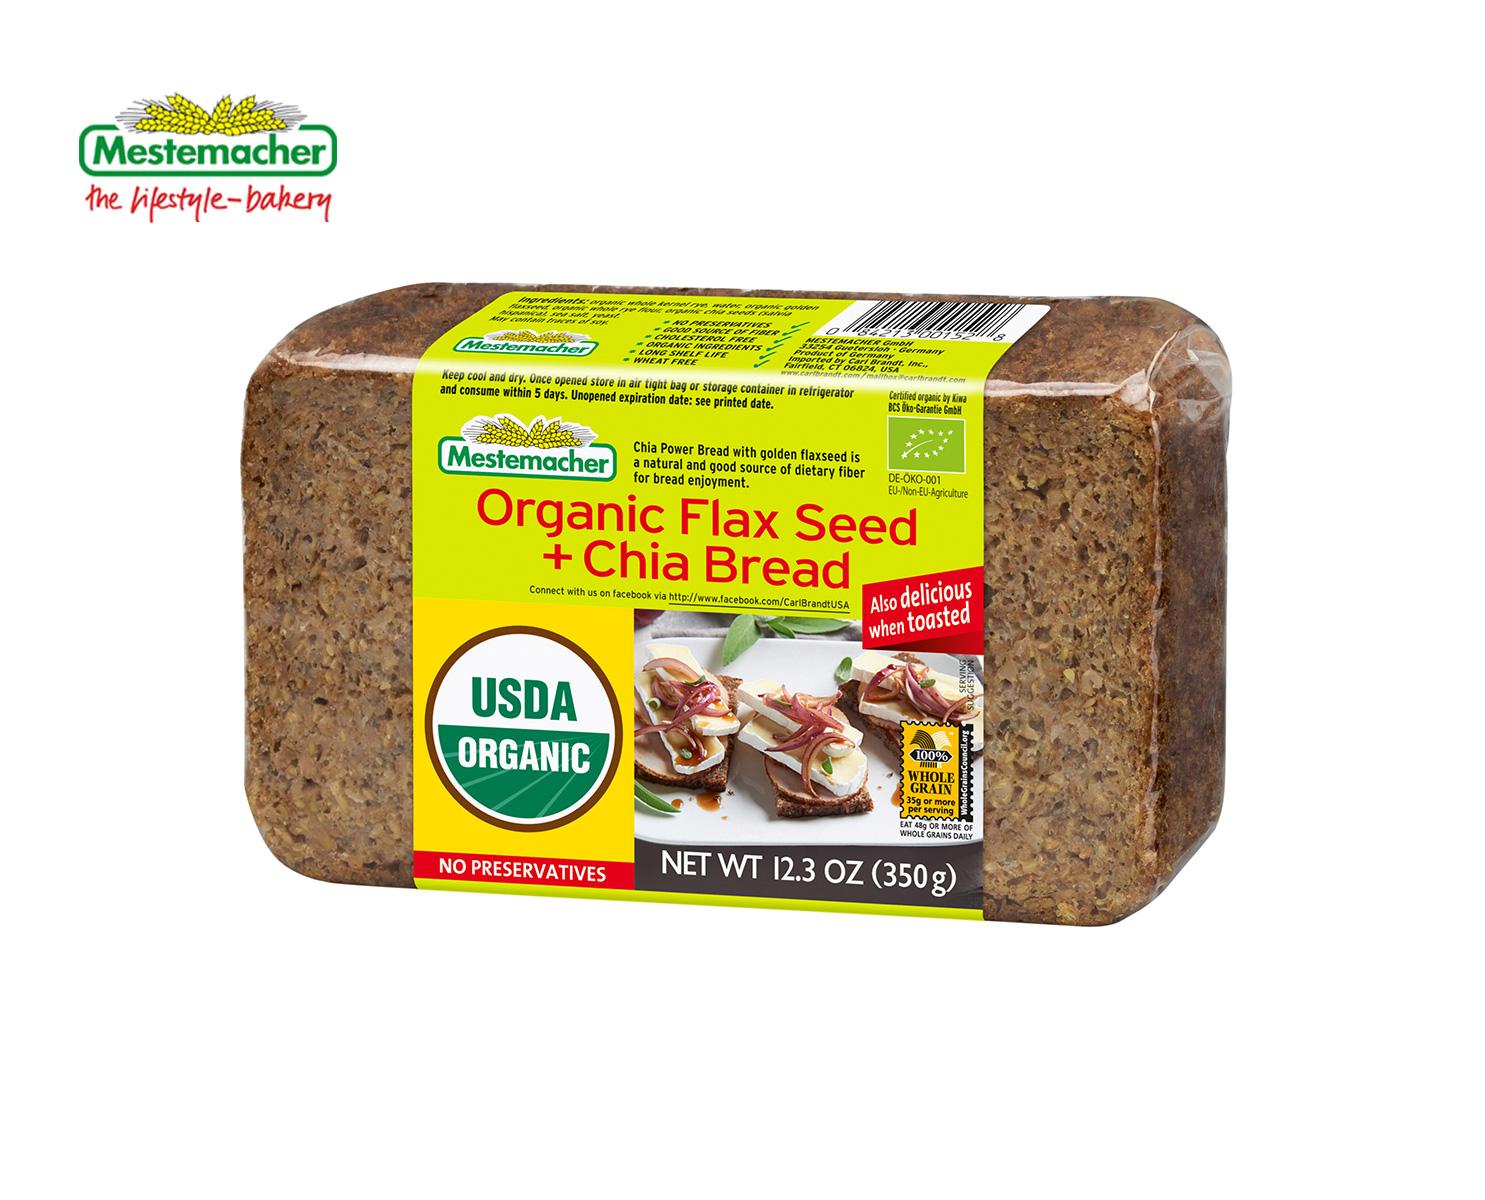 Organic Flax Seed + Chia Bread – Mestemacher